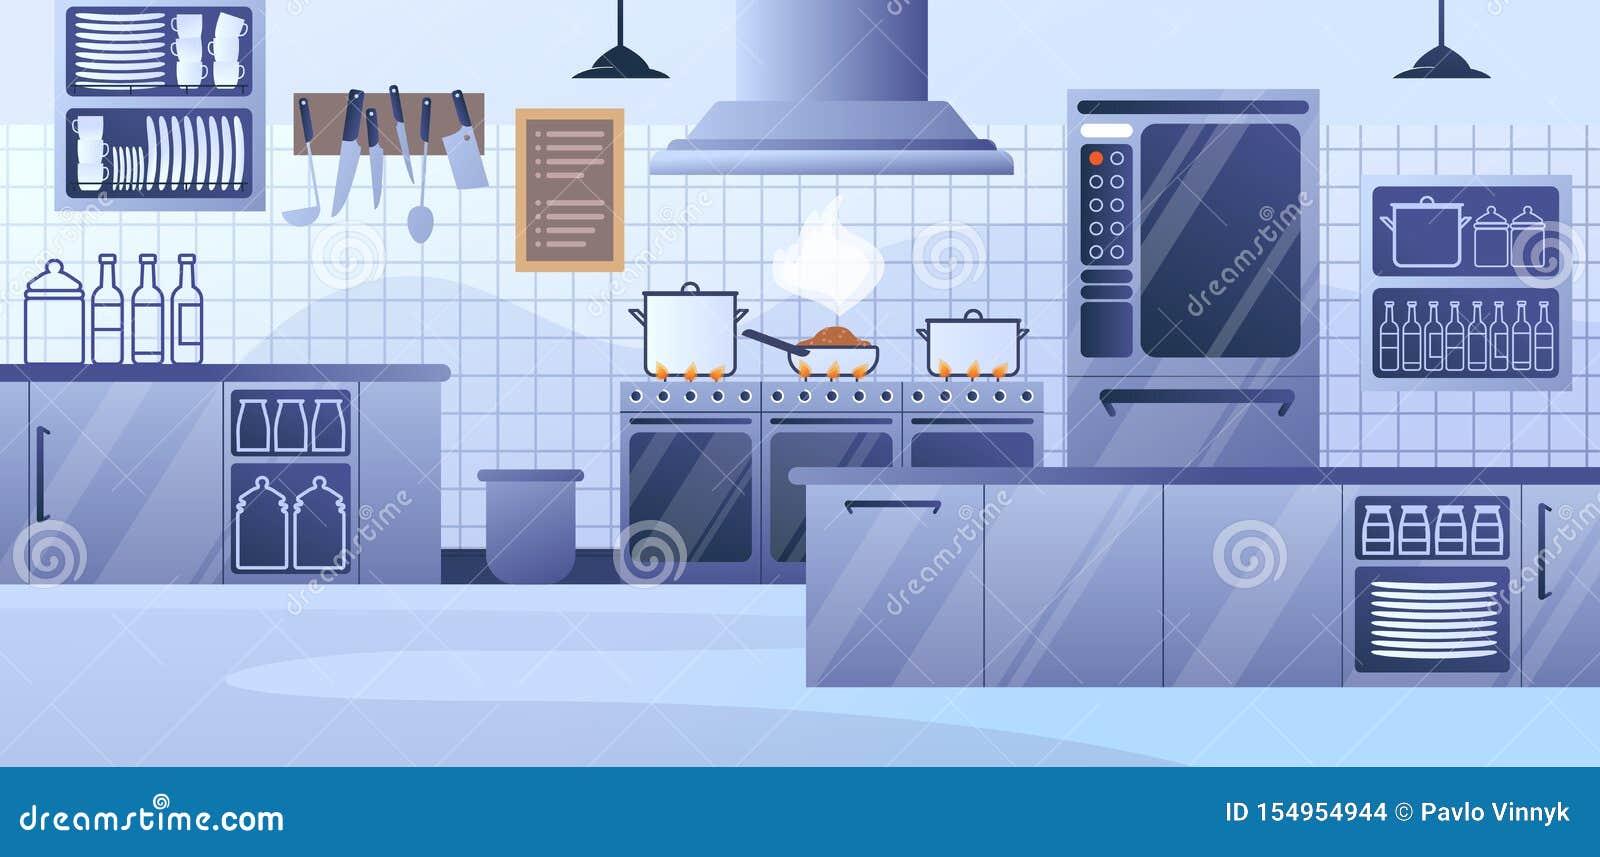 Modern Restaurant Kitchen Interior Flat Vector Stock Vector Illustration Of Metal Dishes 154954944